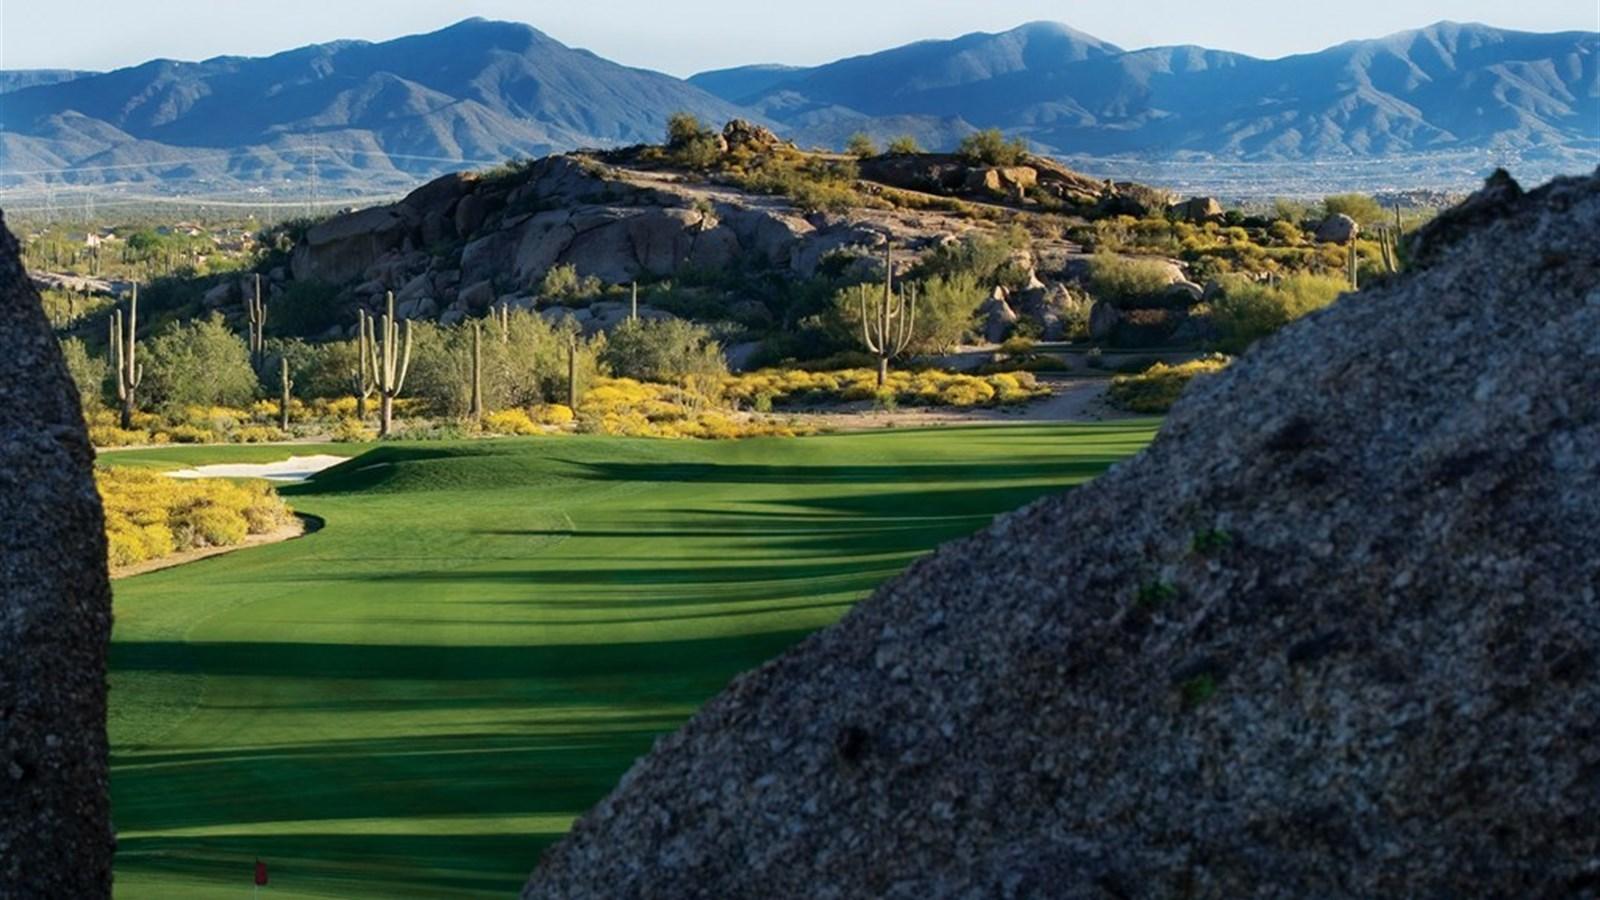 Land for Sale at Esperanza Estates at Pinnacle Peak Lot 26653 N 95th Street 17 Scottsdale, Arizona 85262 United States